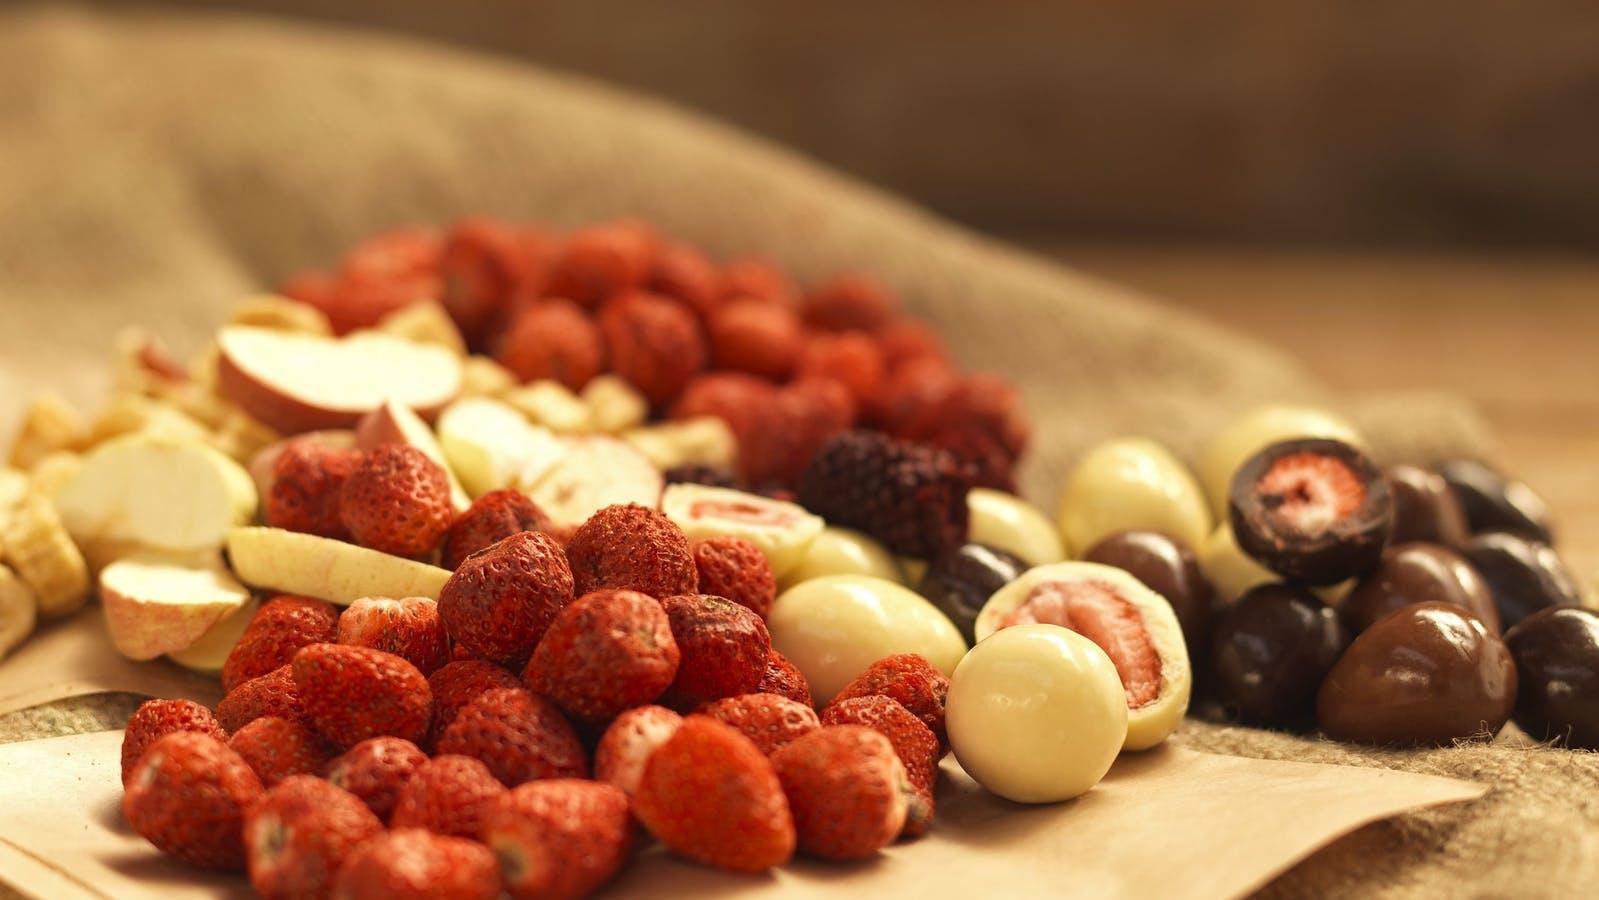 Freeze dried raspberries and strawberries in chocolate